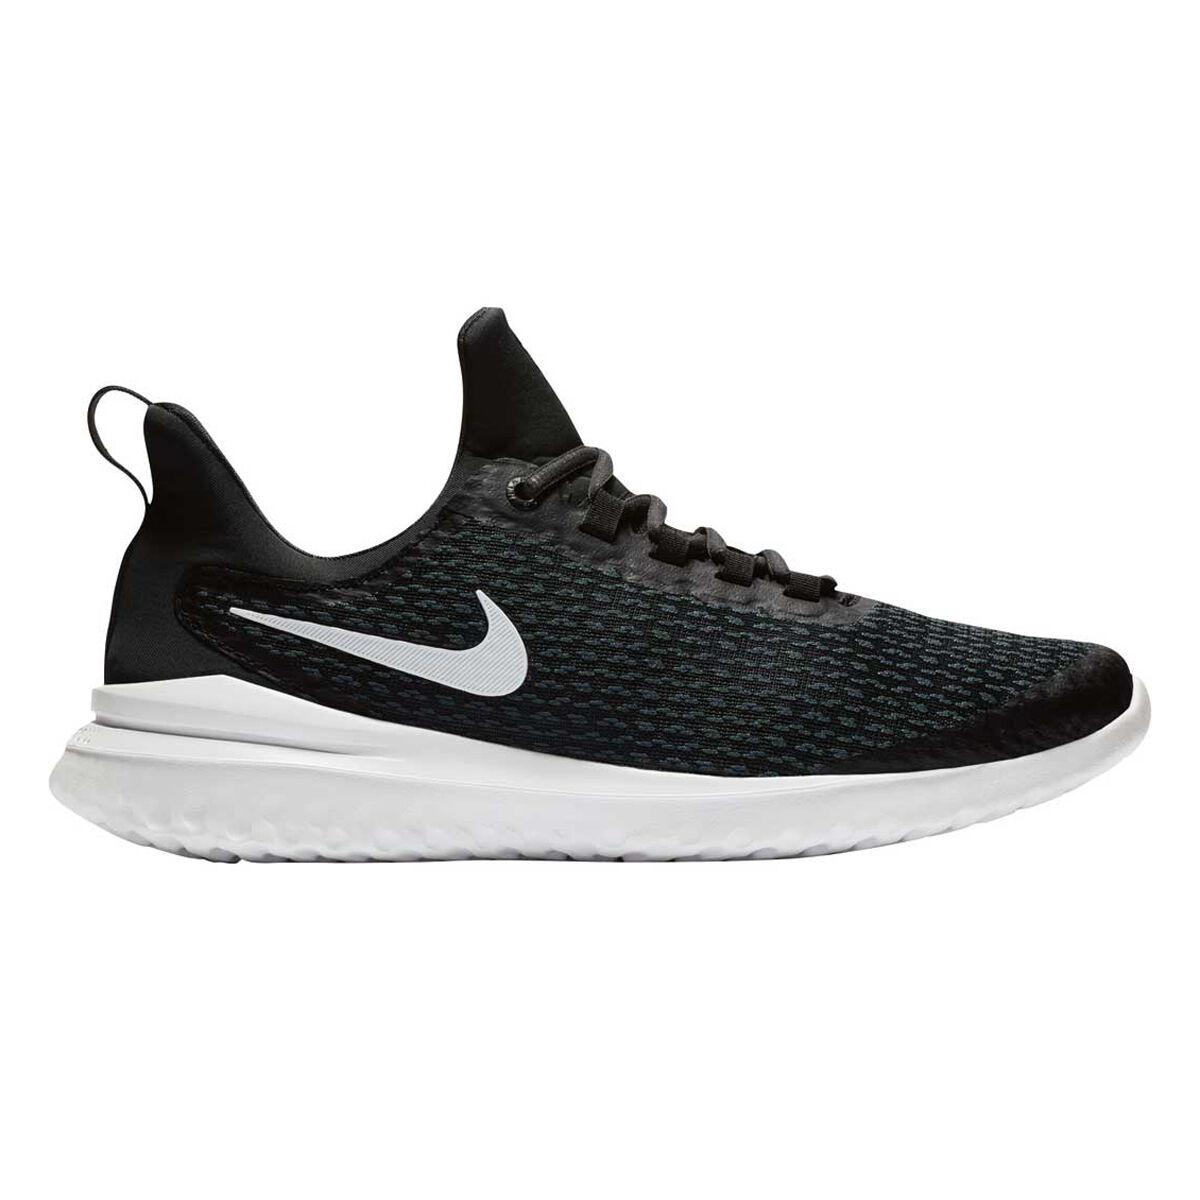 Nike Renew Revival Mens Running Shoes